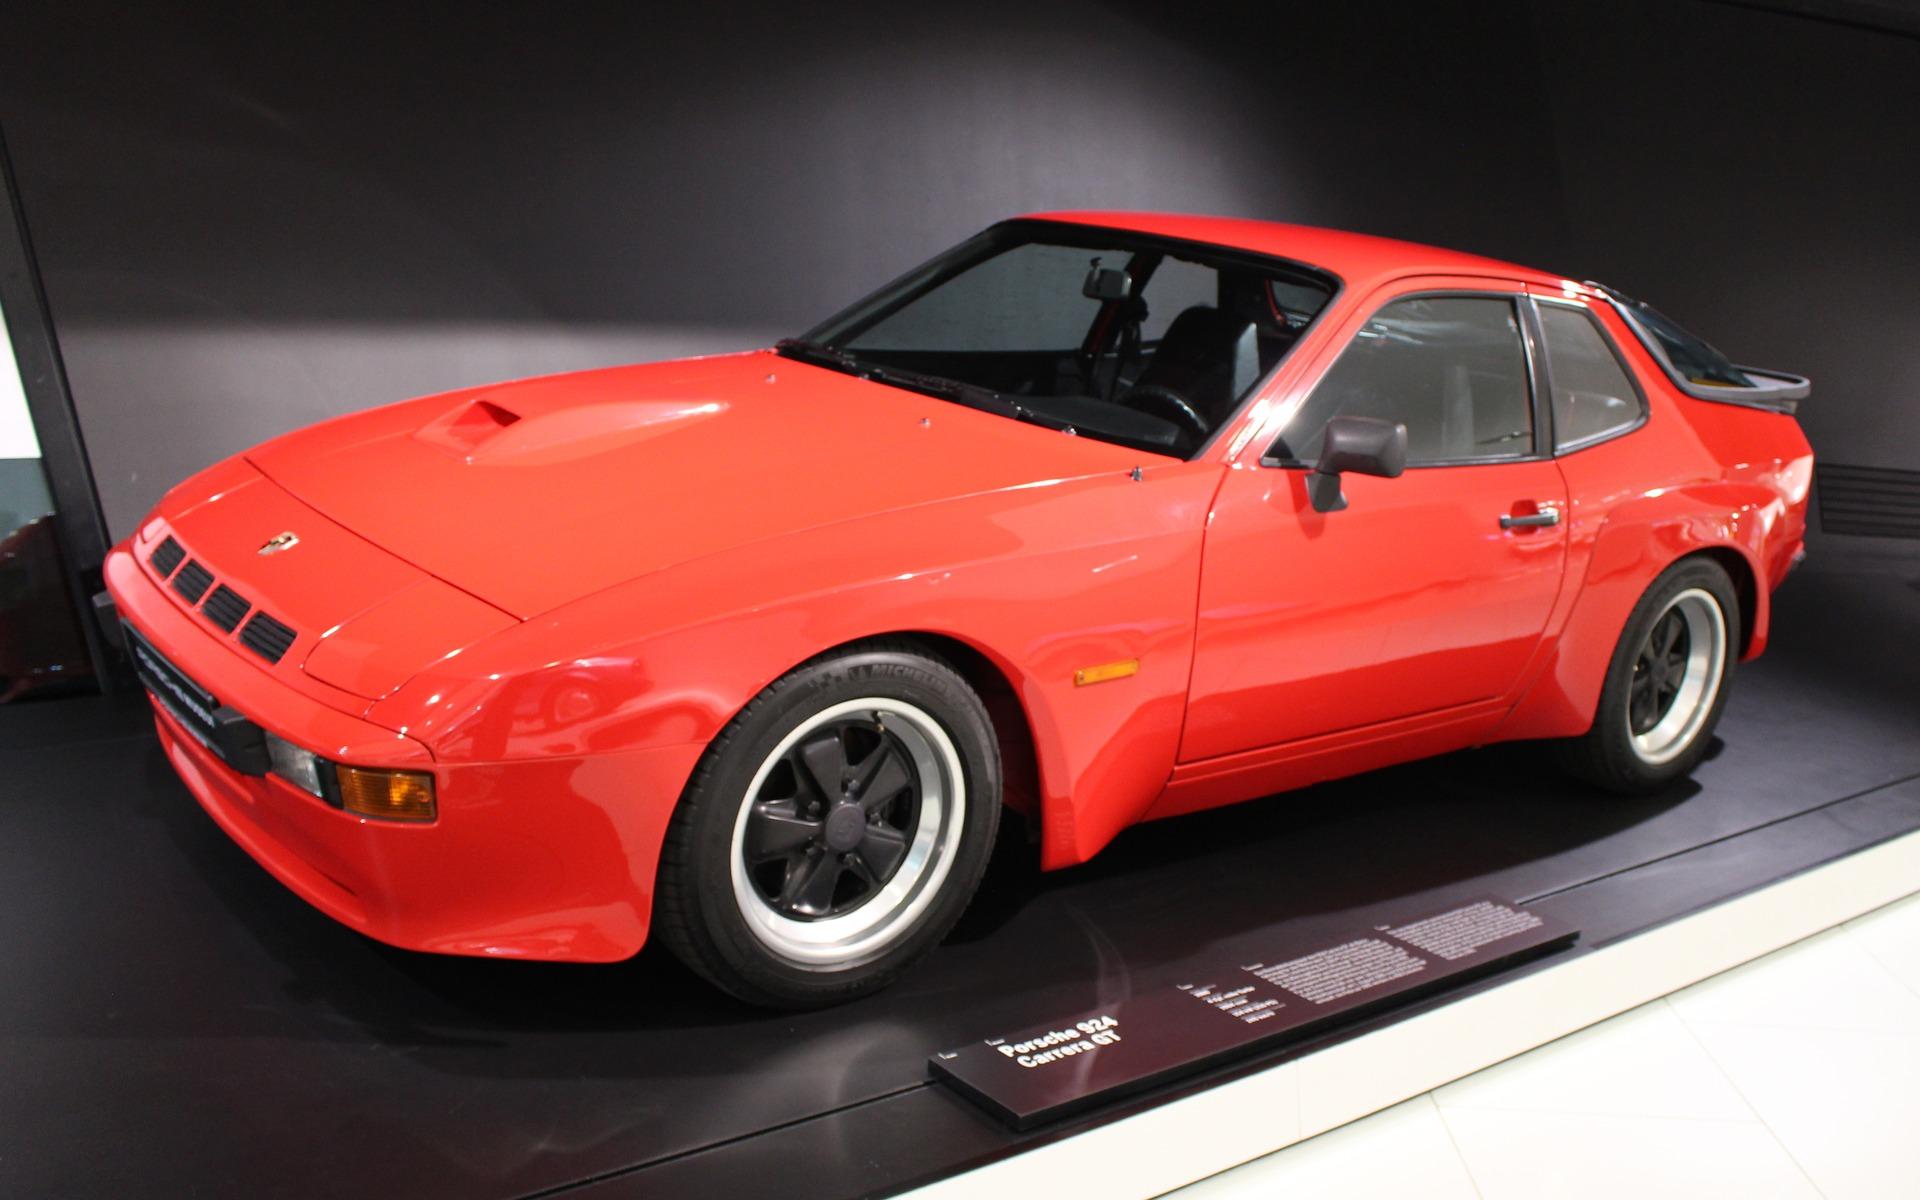 Dealers Cars Com >> Porsche Museum: The Road Cars - 33/50